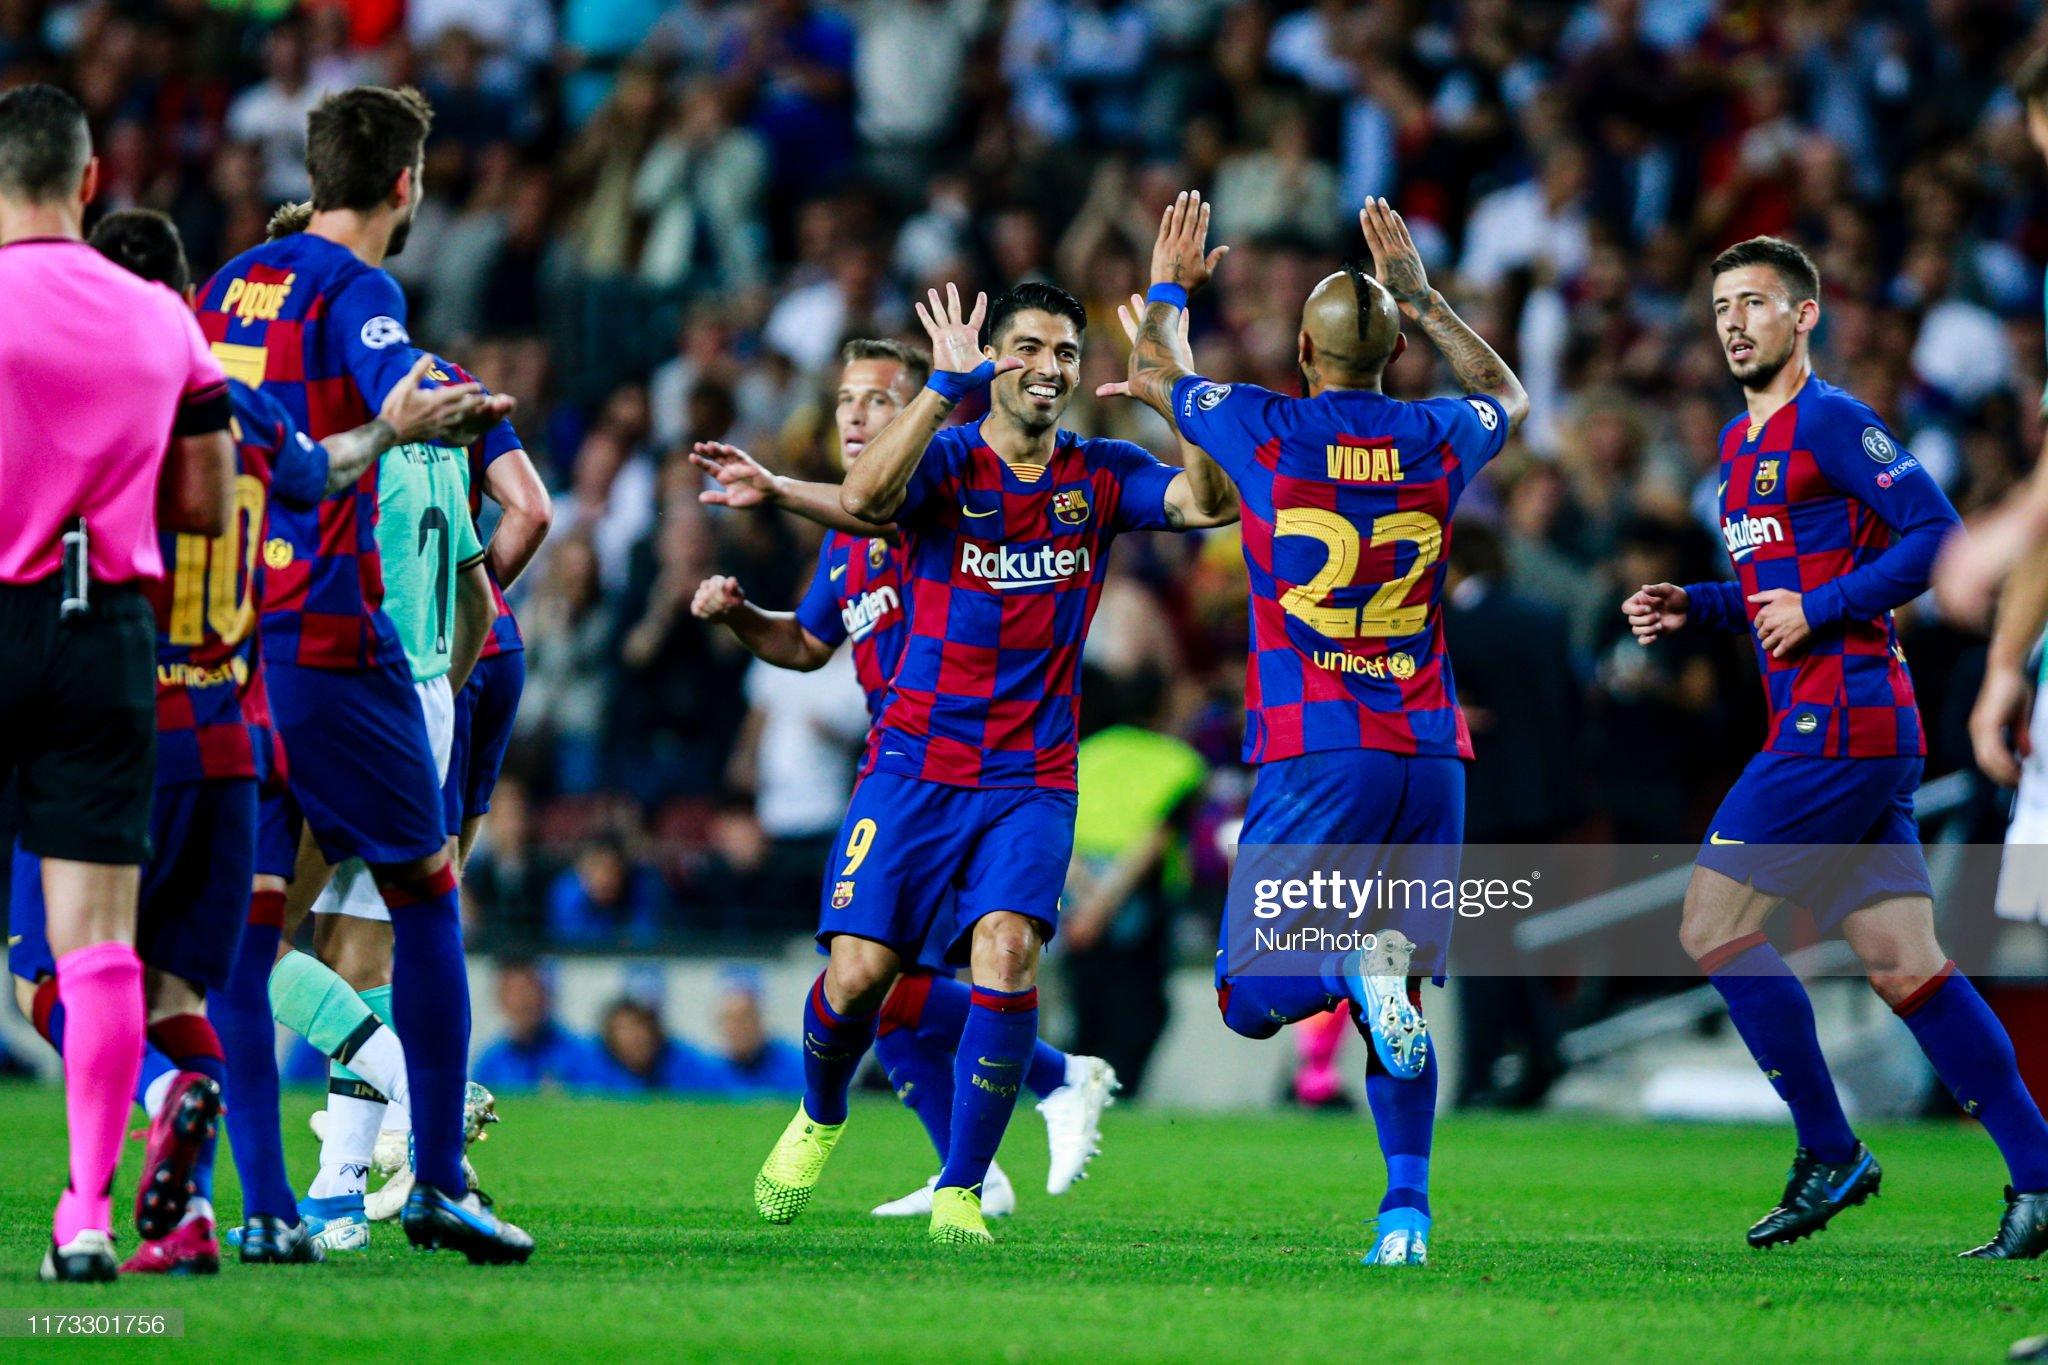 صور مباراة : برشلونة - إنتر 2-1 ( 02-10-2019 )  Luis-suarez-from-uruguay-of-fc-barcelona-celebrating-his-goal-with-22-picture-id1173301756?s=2048x2048